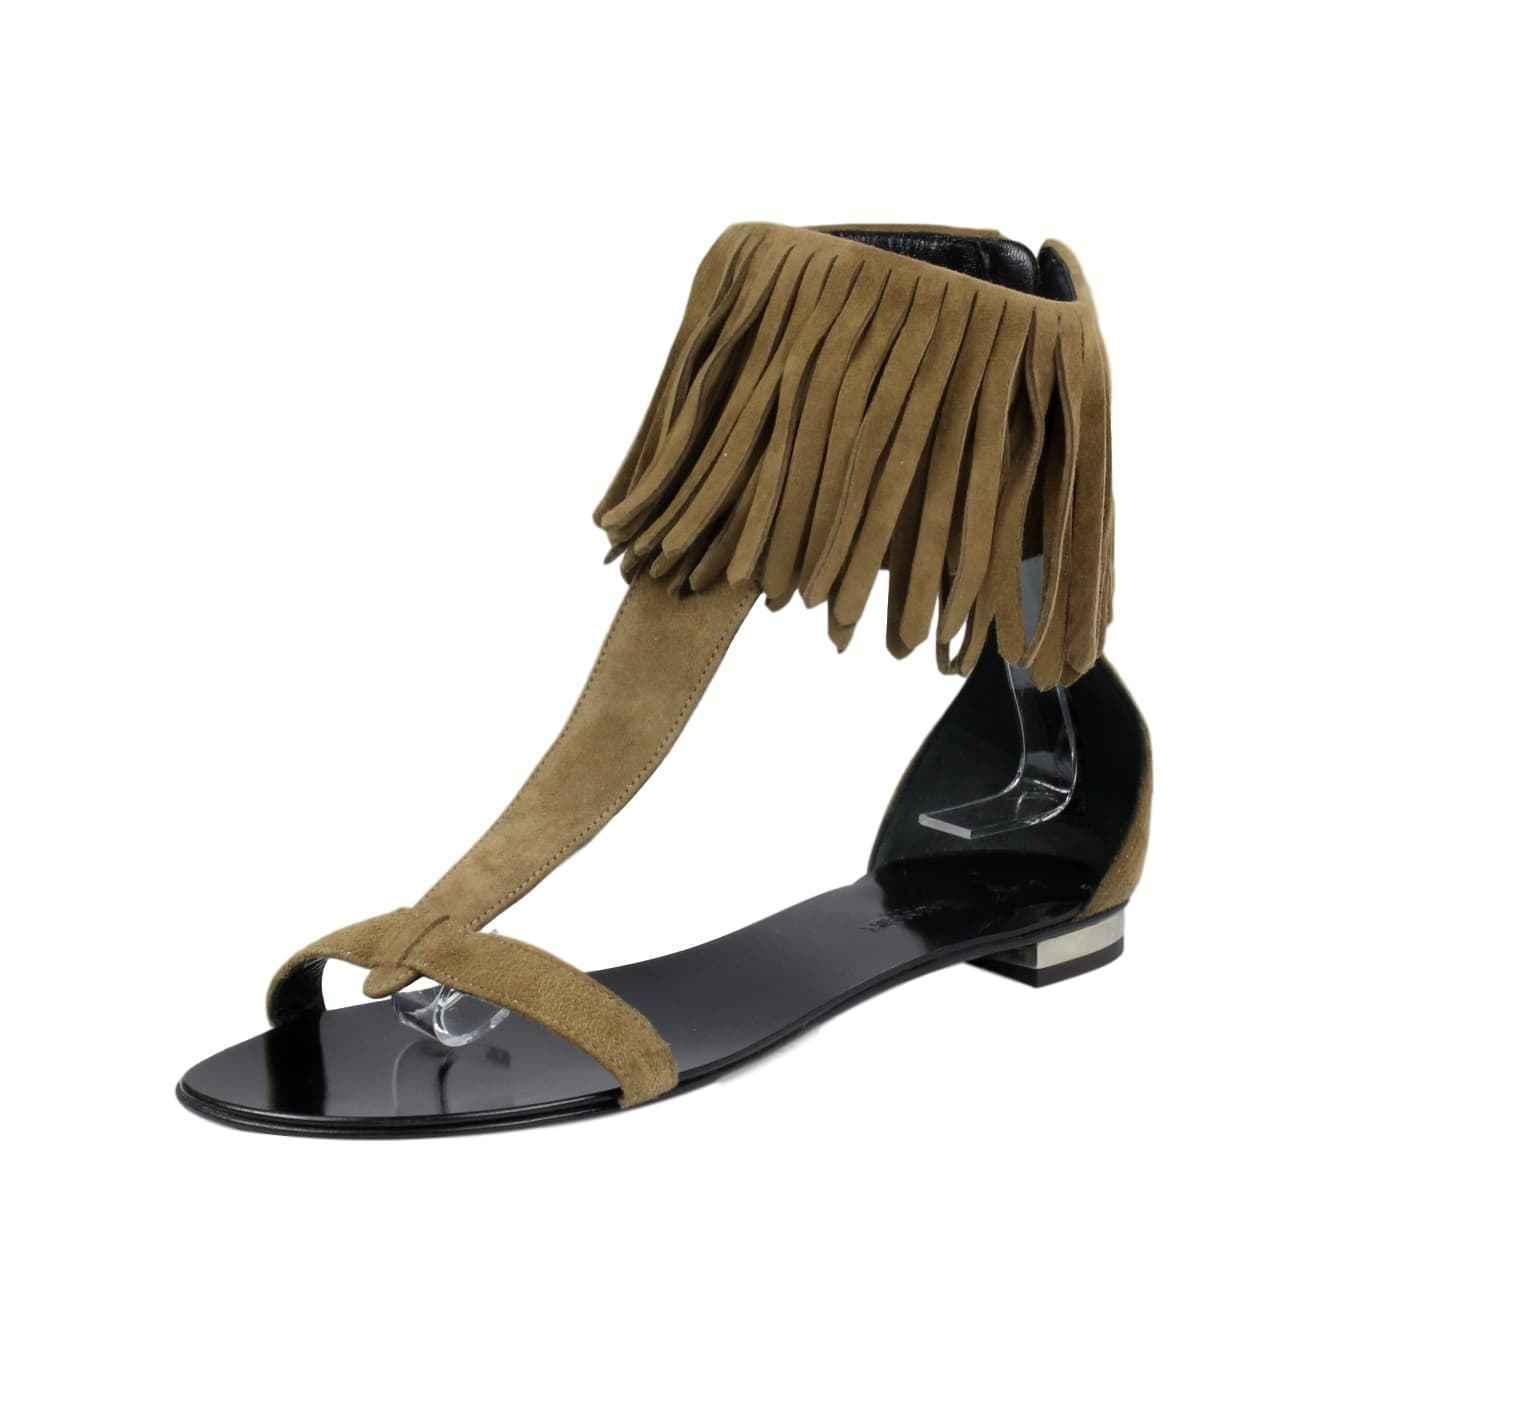 NWT Giuseppe Zanotti x Balmain Brown Suede Ankle Fringe Sandals SZ US 8 Ret  745